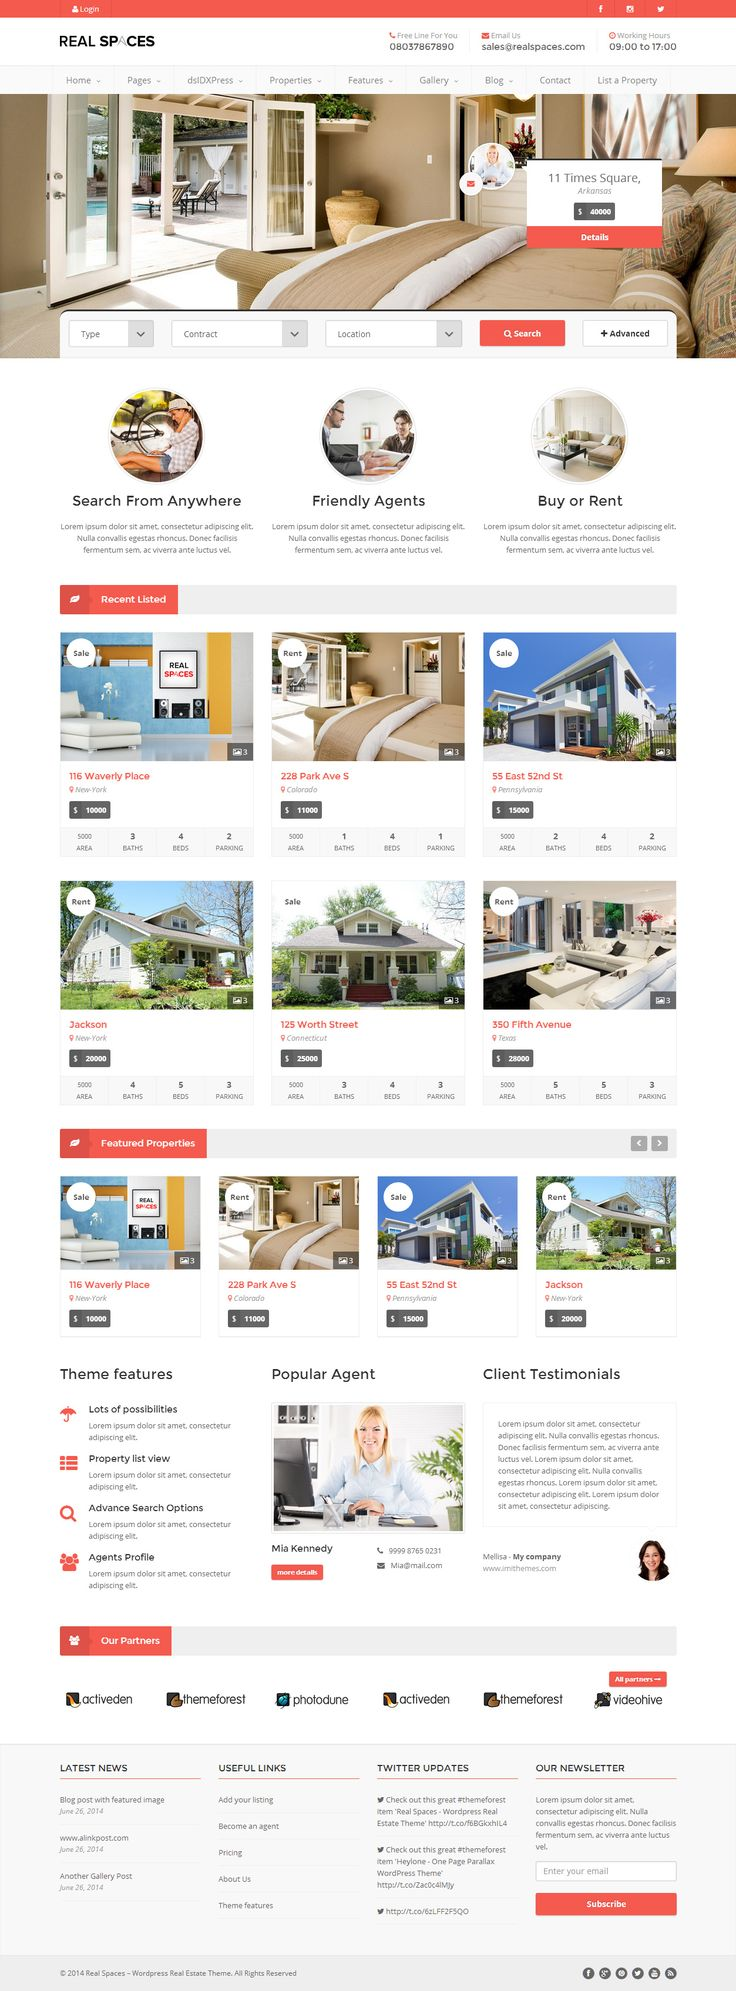 Real Spaces is Premium full Responsive WordPress Real Estate theme. Retina Ready. Bootstrap Framework. Isotope galleries. http://www.responsivemiracle.com/cms/real-spaces-premium-responsive-real-estate-wordpress-theme/